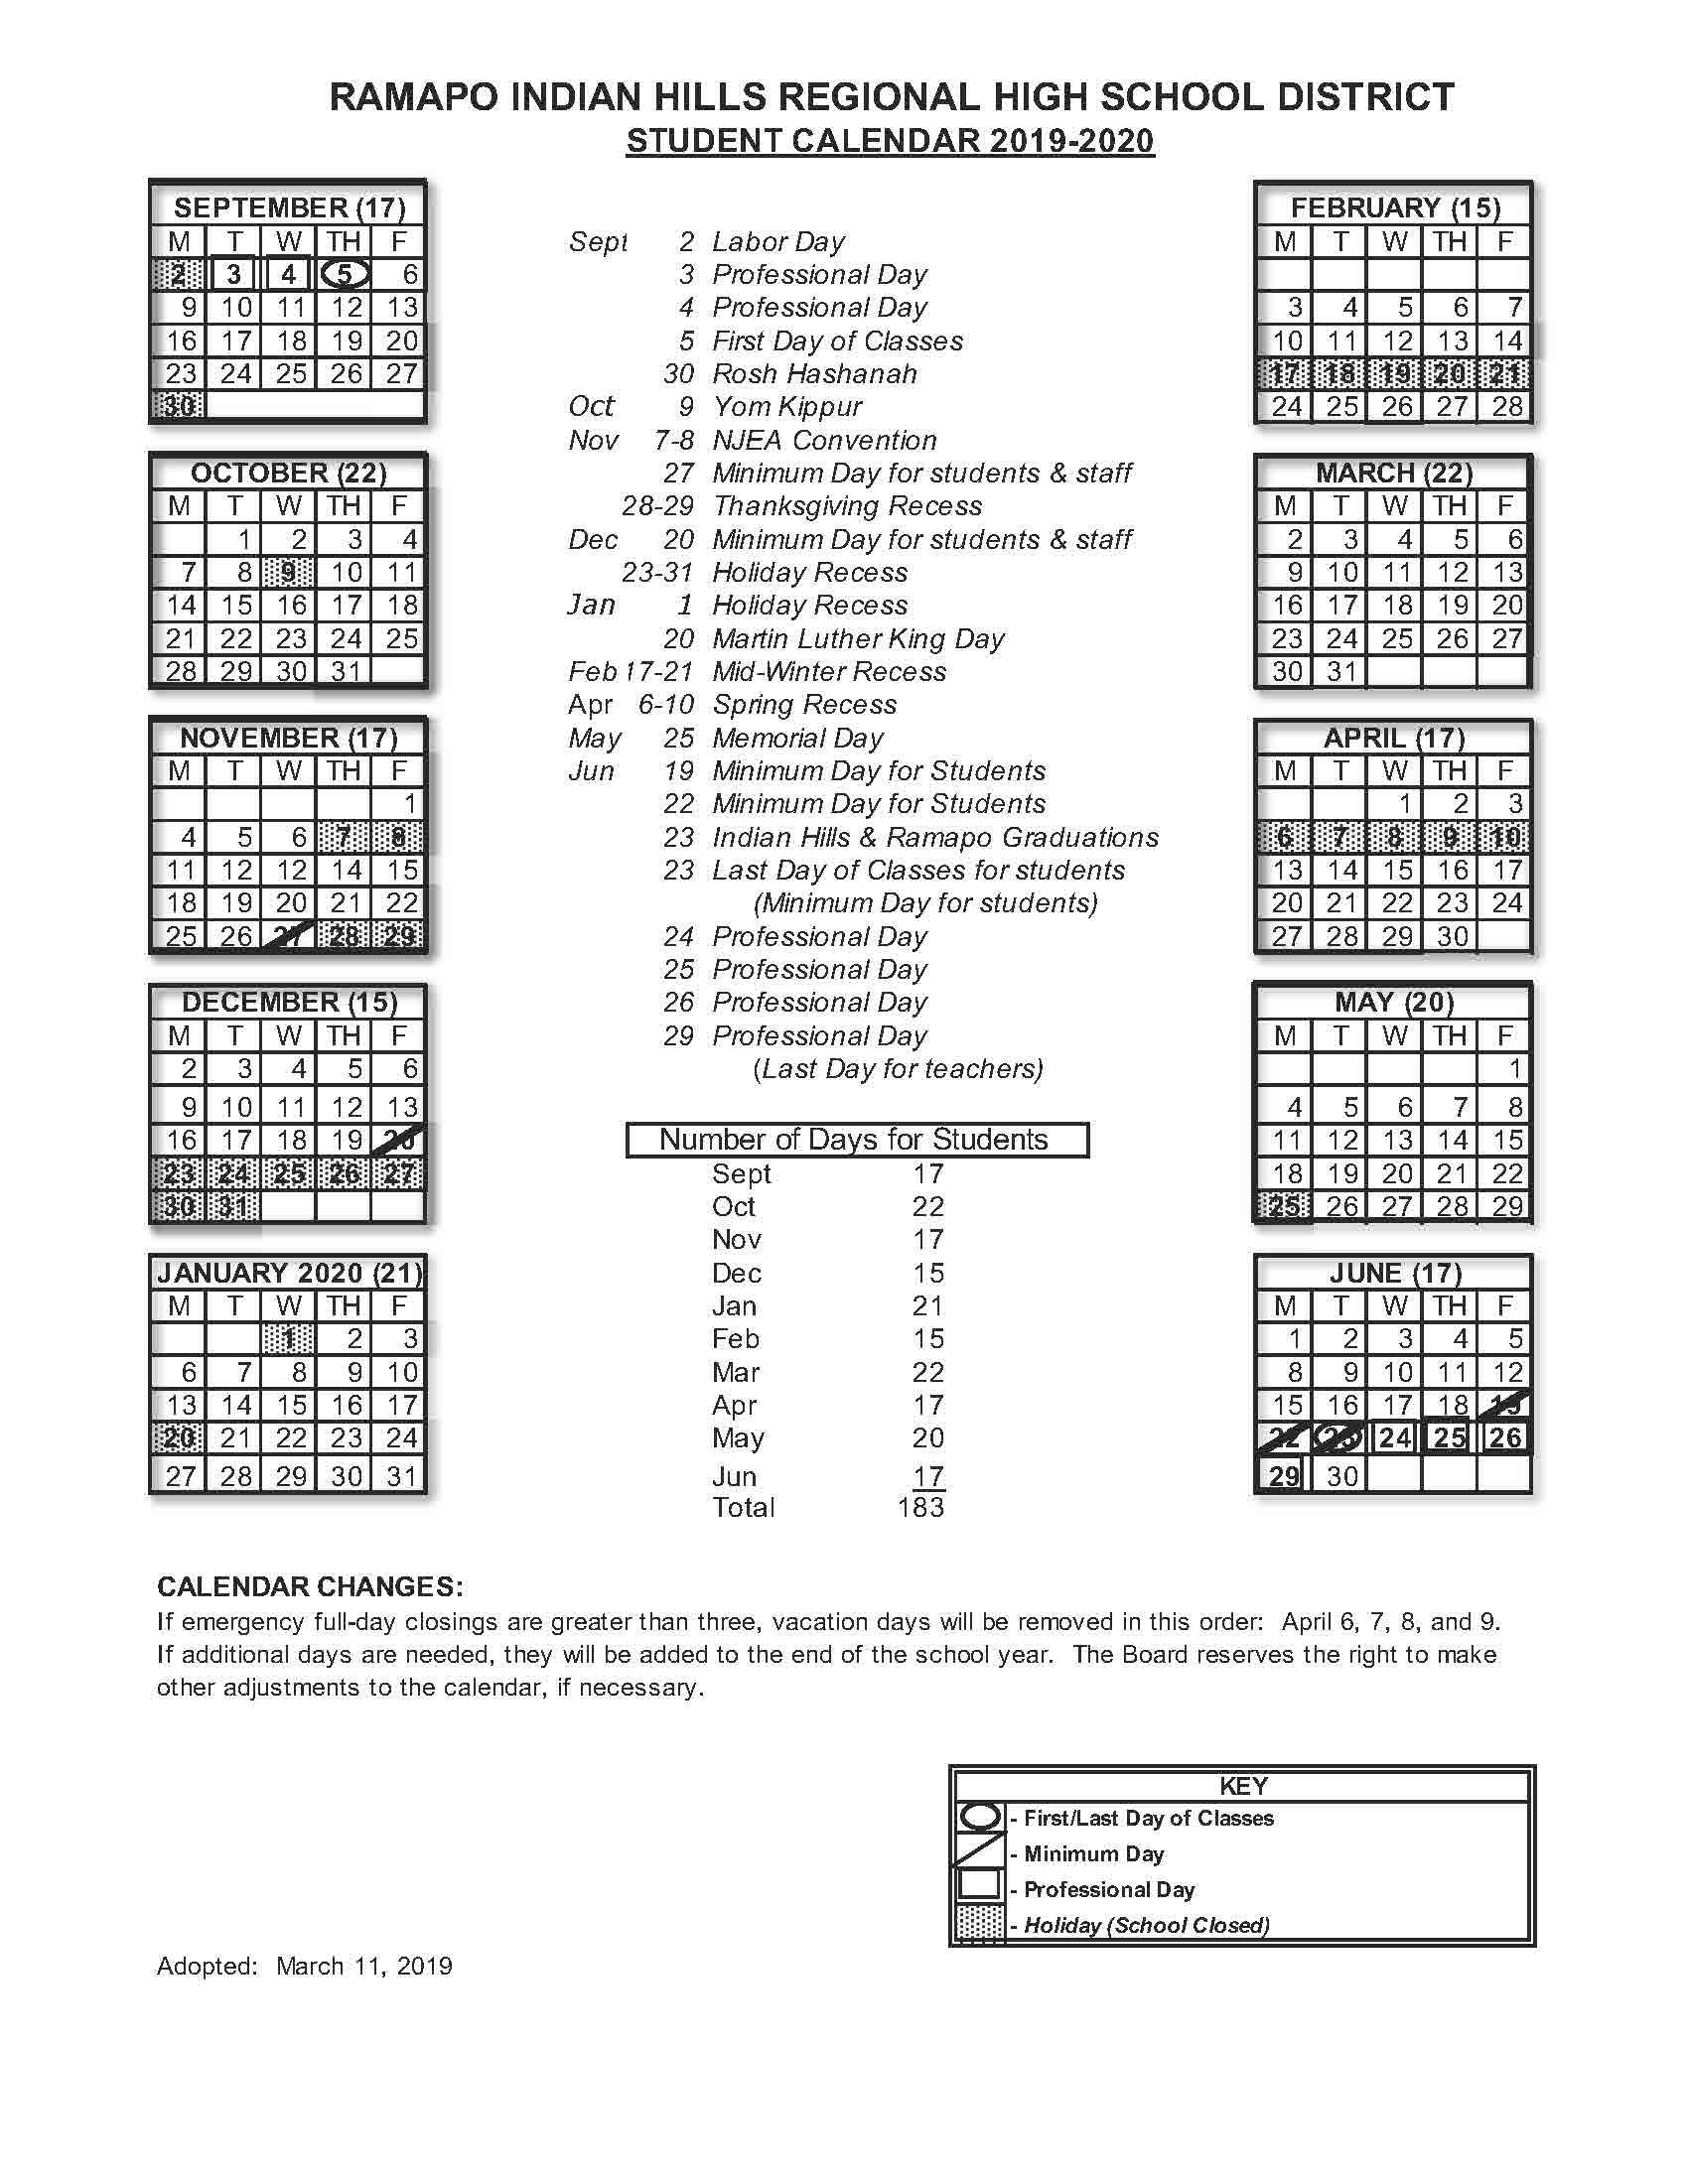 2019 2020 Student Calendar - Rihrhsd Regarding Nassau Community College Spring 2020 Student Calendar